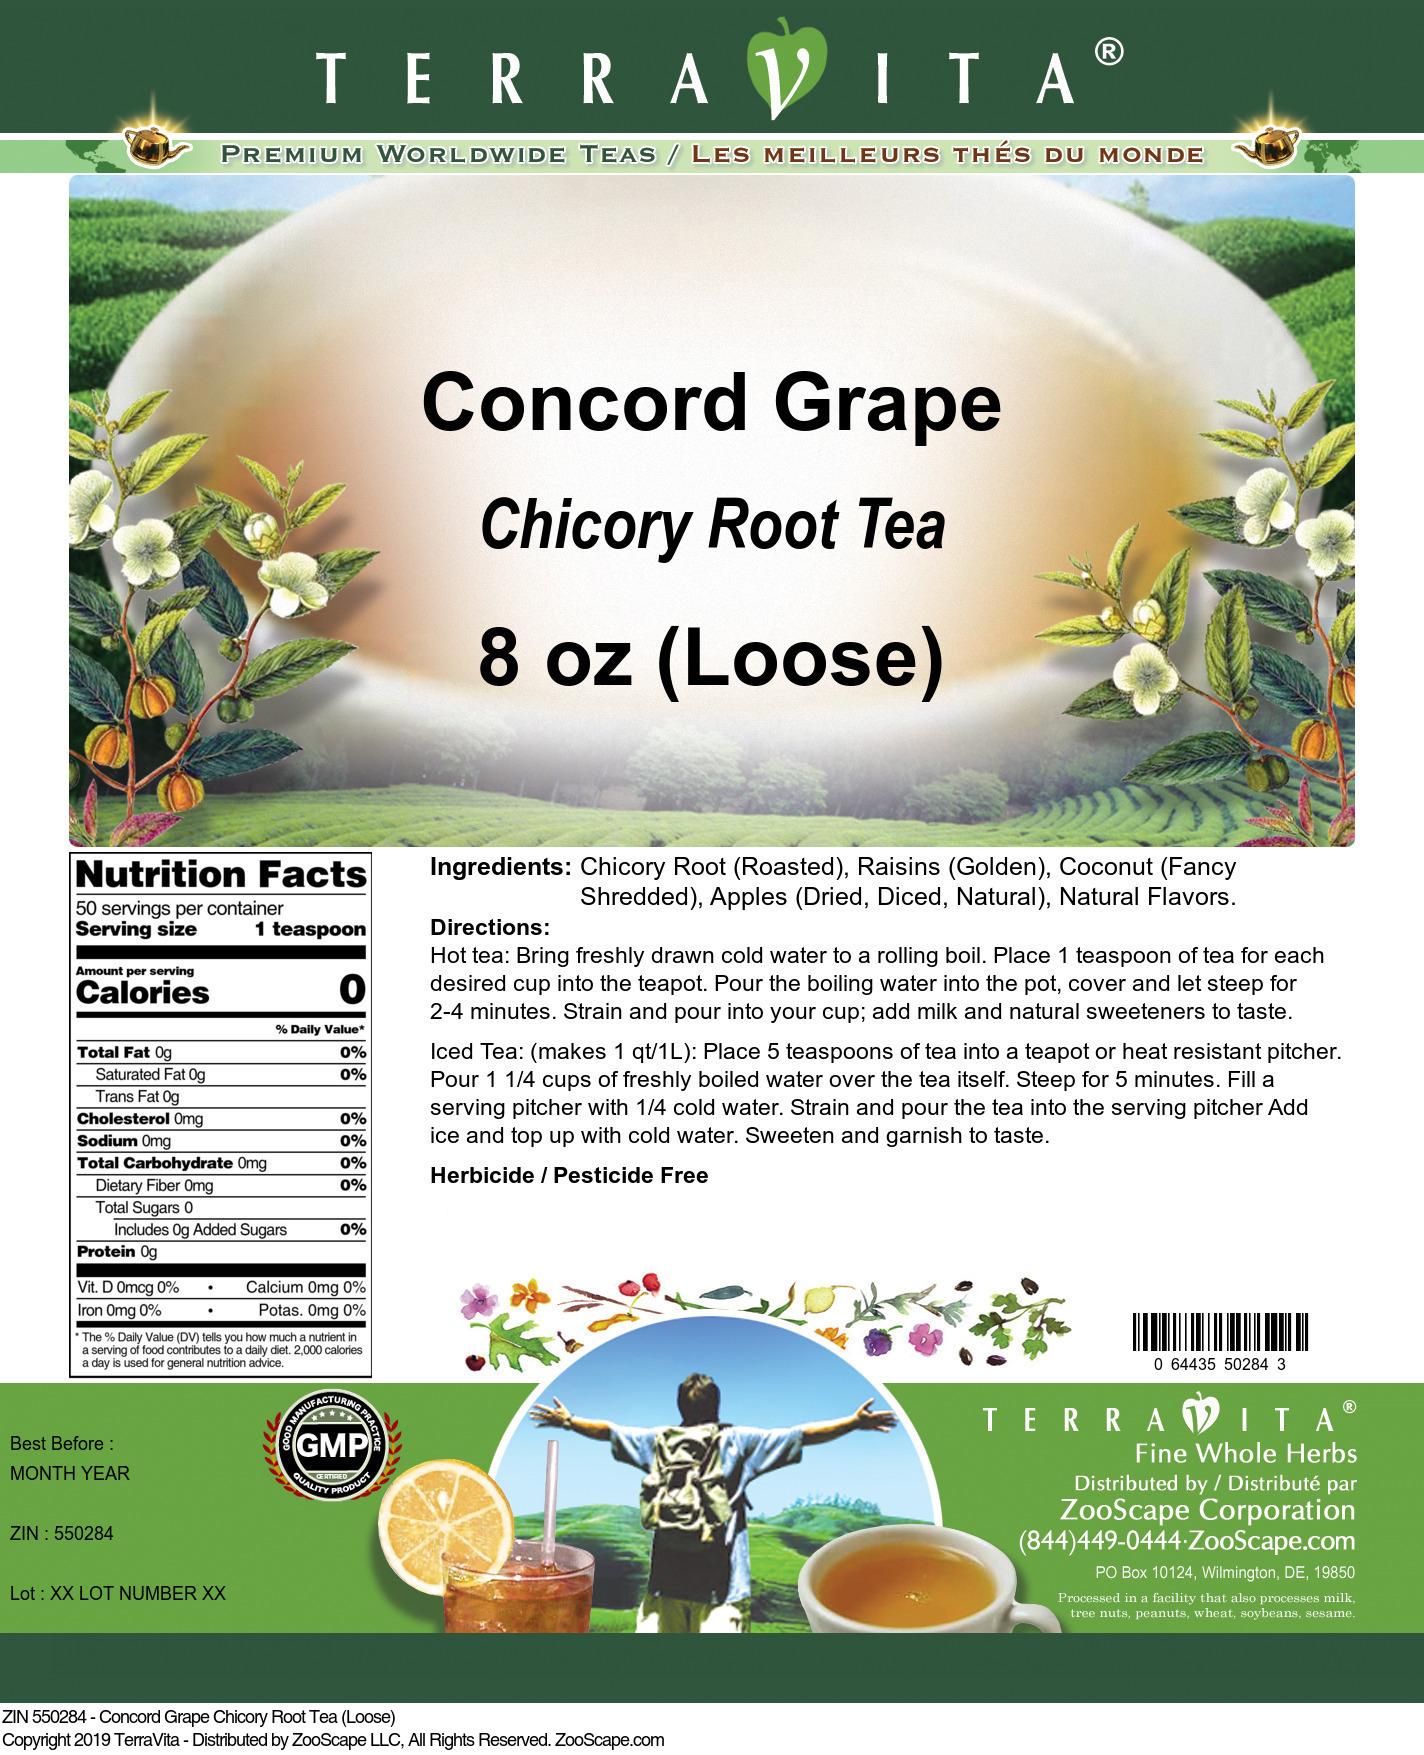 Concord Grape Chicory Root Tea (Loose)